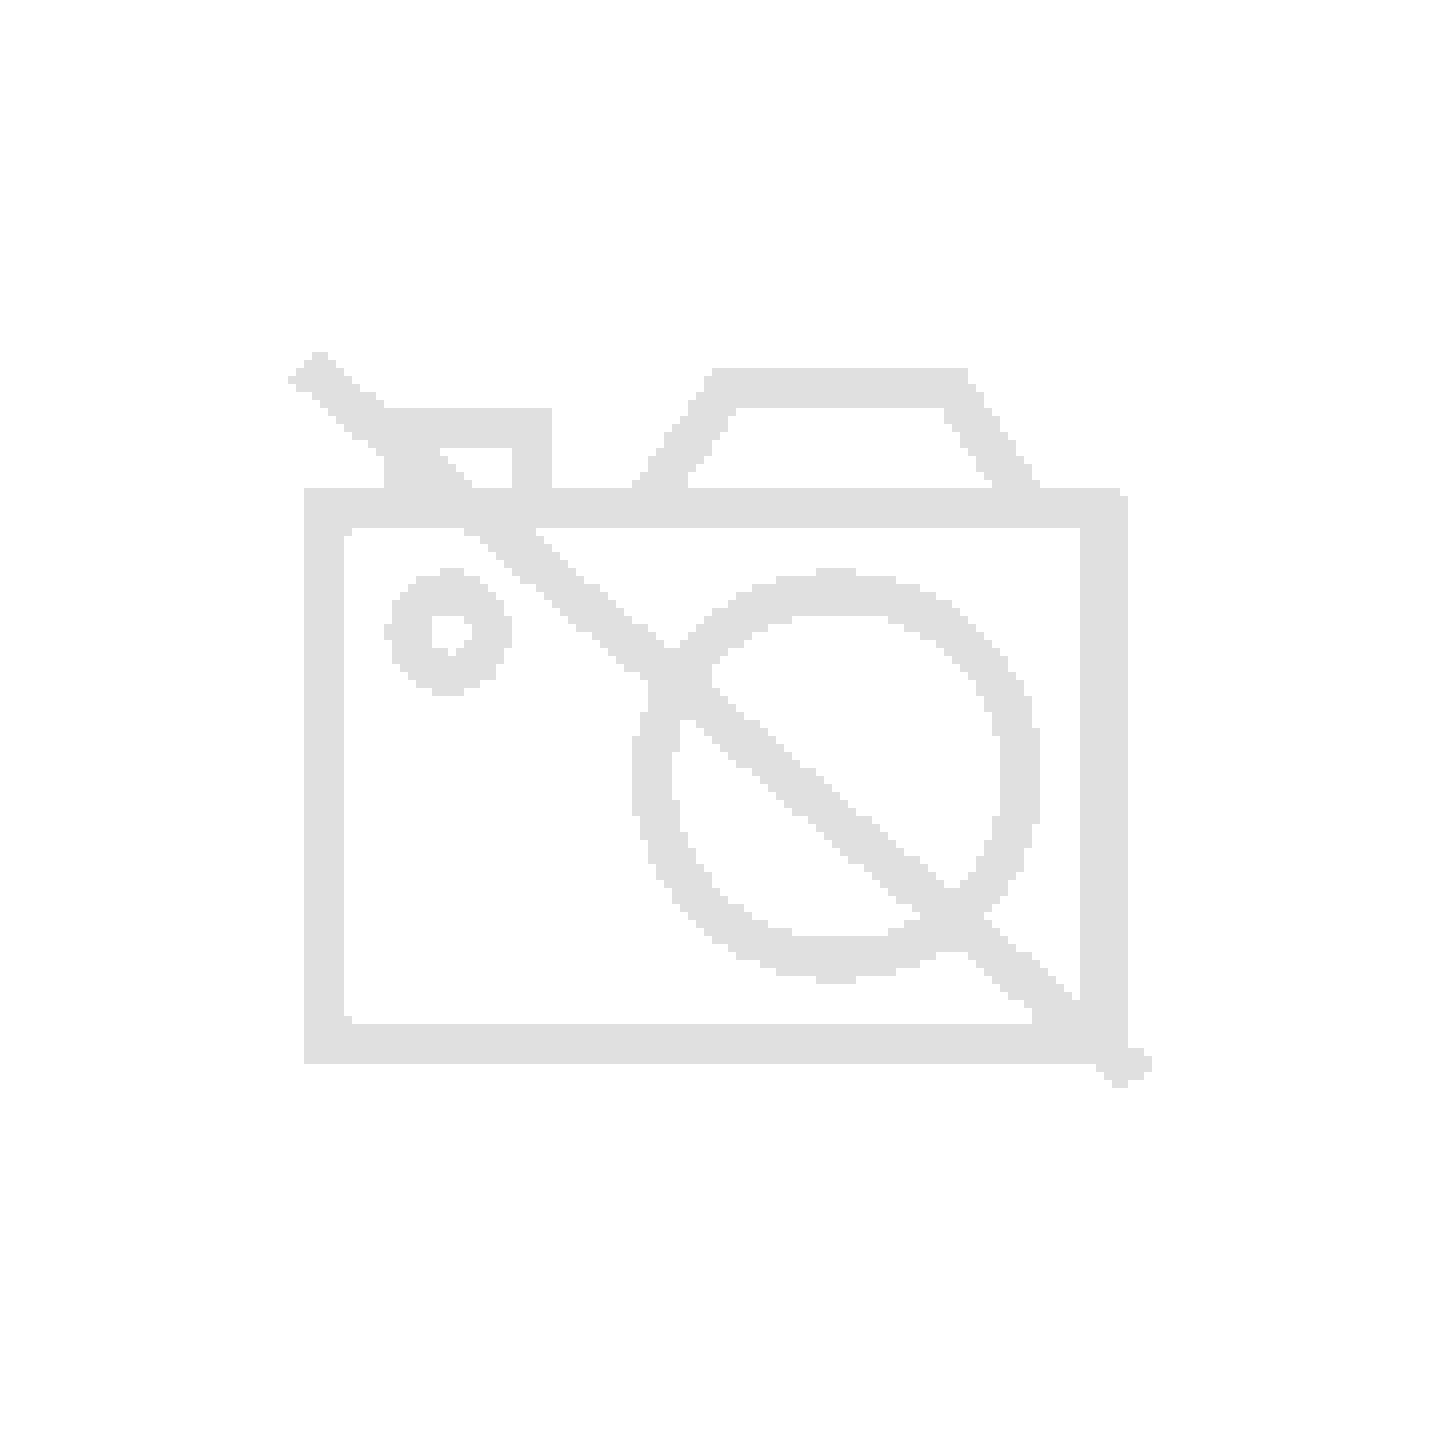 Epson EcoTank ET-2750 Tintenstrahl-Multifunktionsdrucker